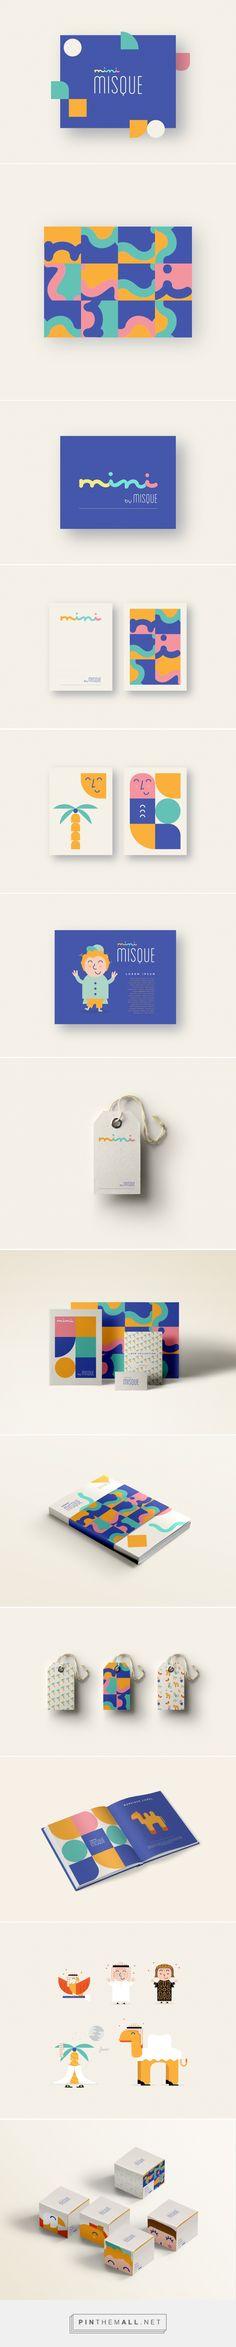 Mini Misque Branding on Behance | Fivestar Branding – Design and Branding Agency & Inspiration Gallery